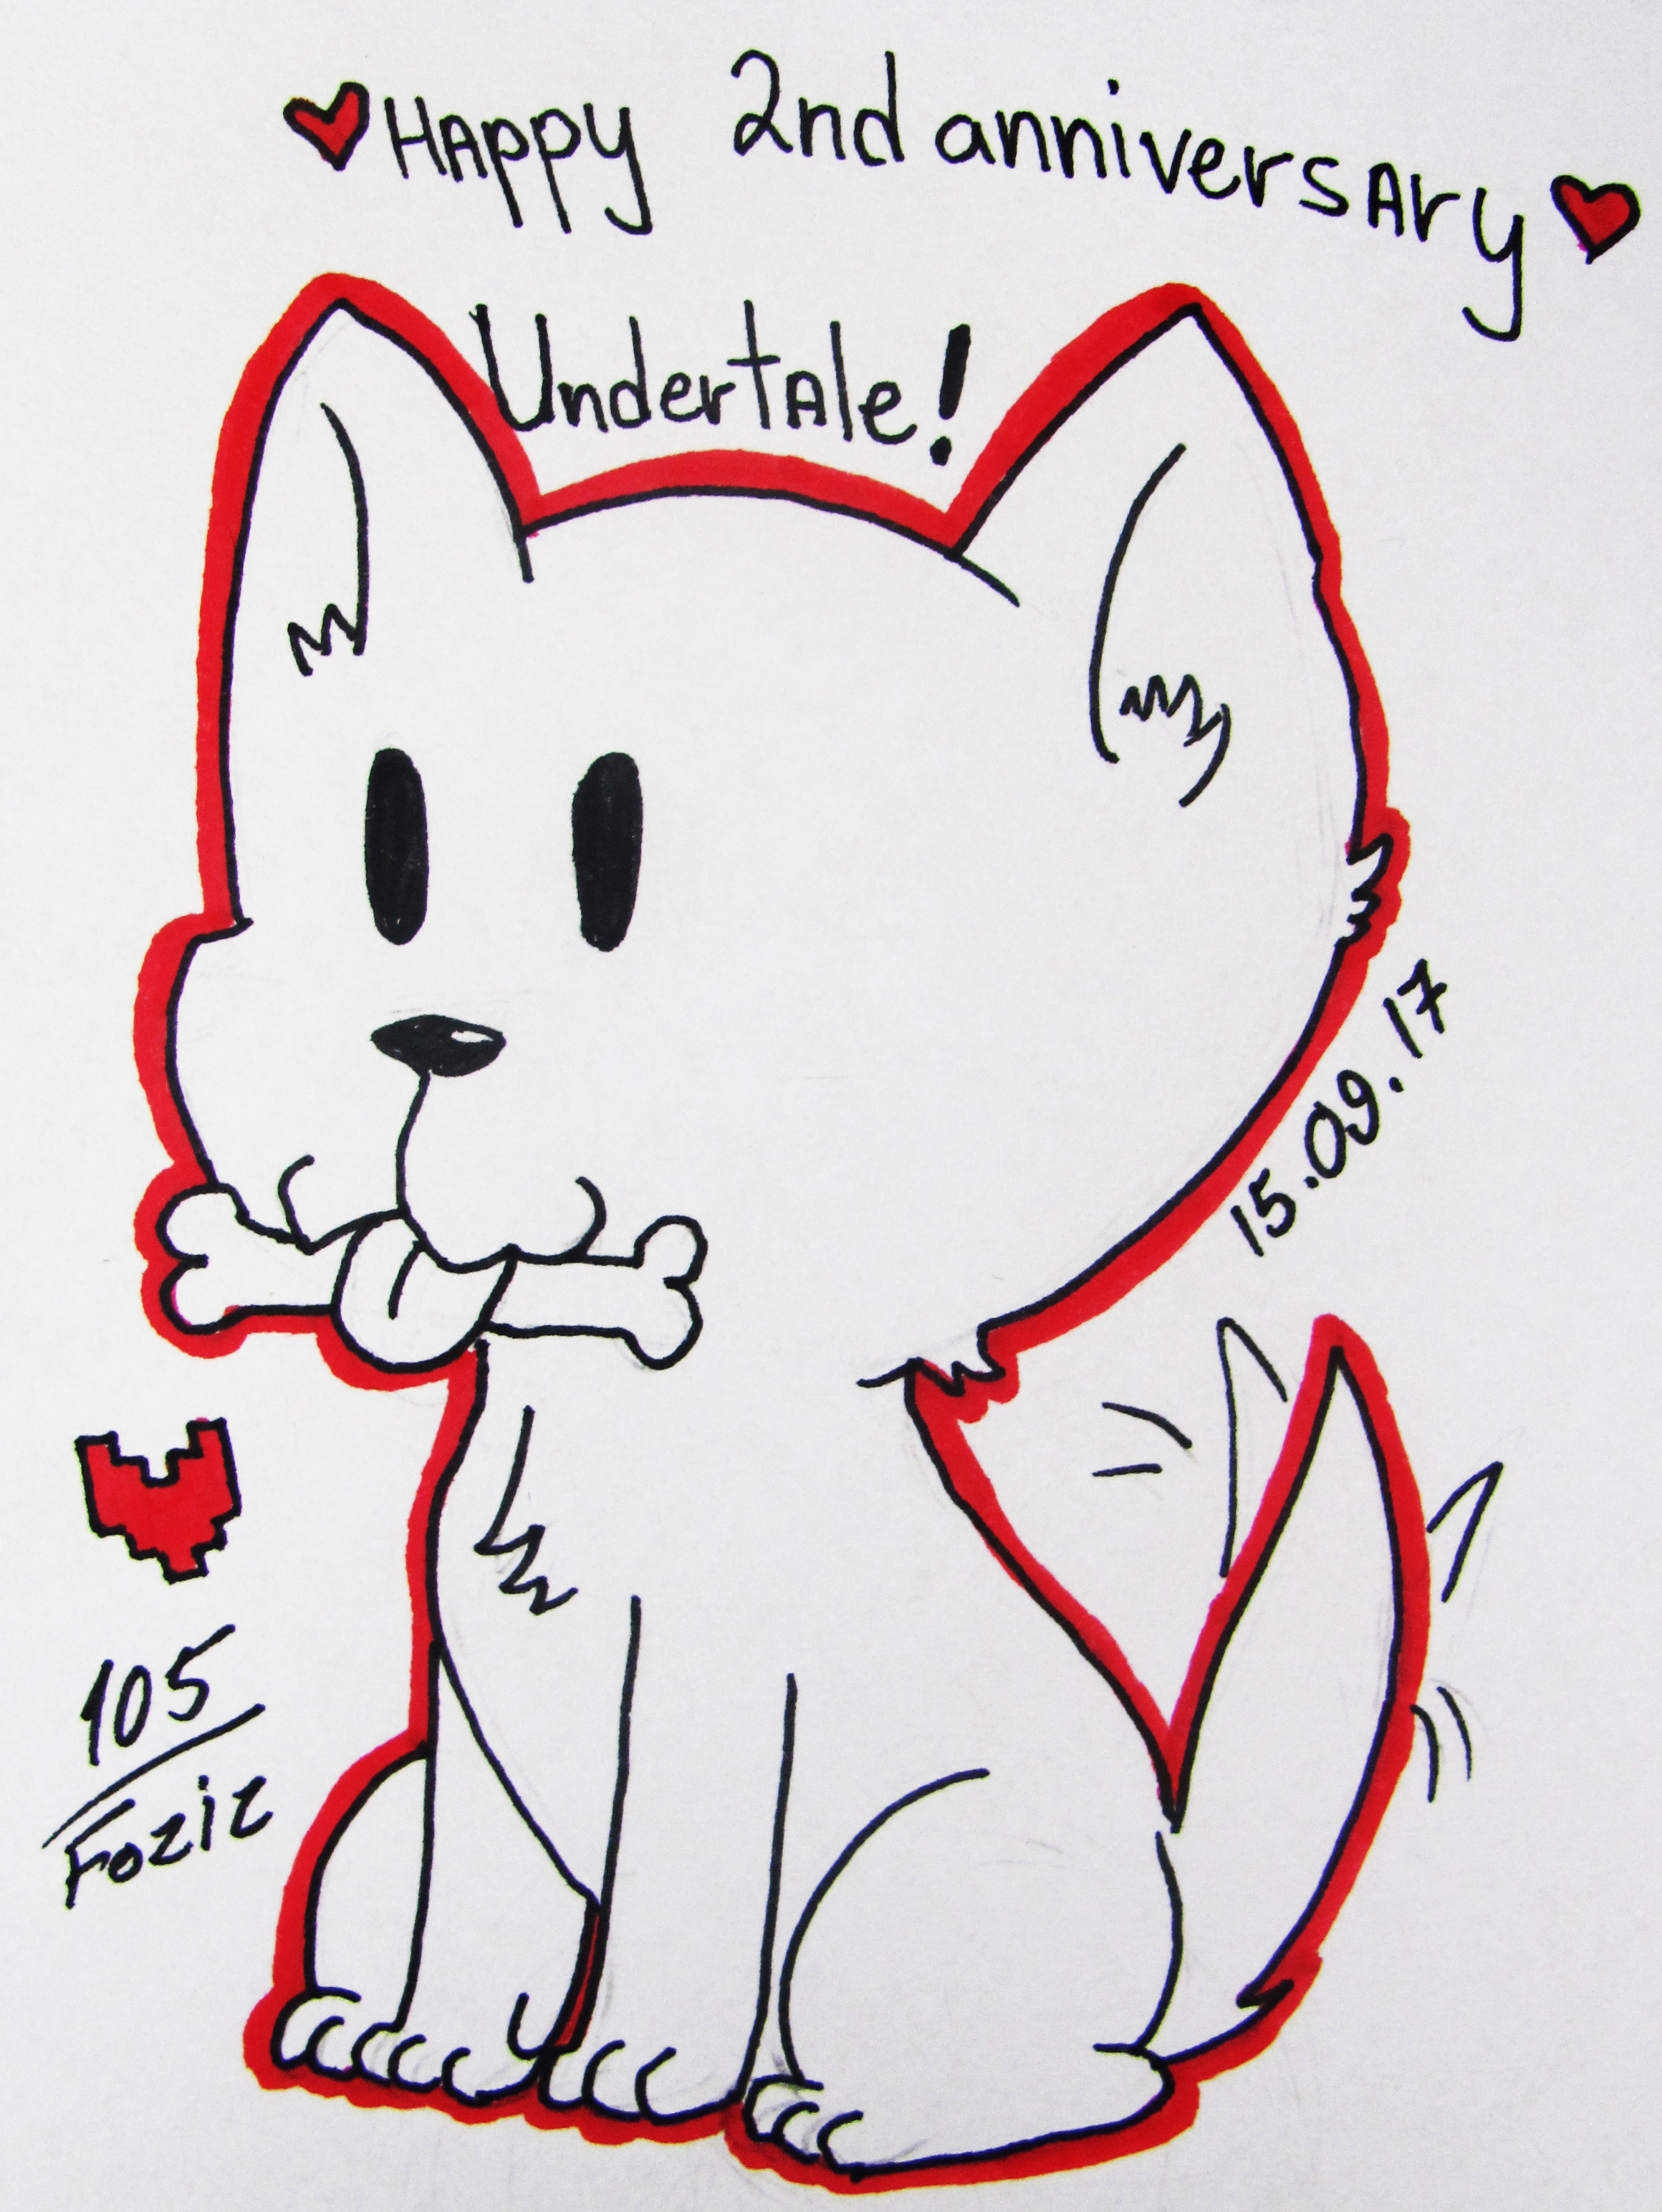 Happy 2nd Anniversary Undertale! by Foziz105